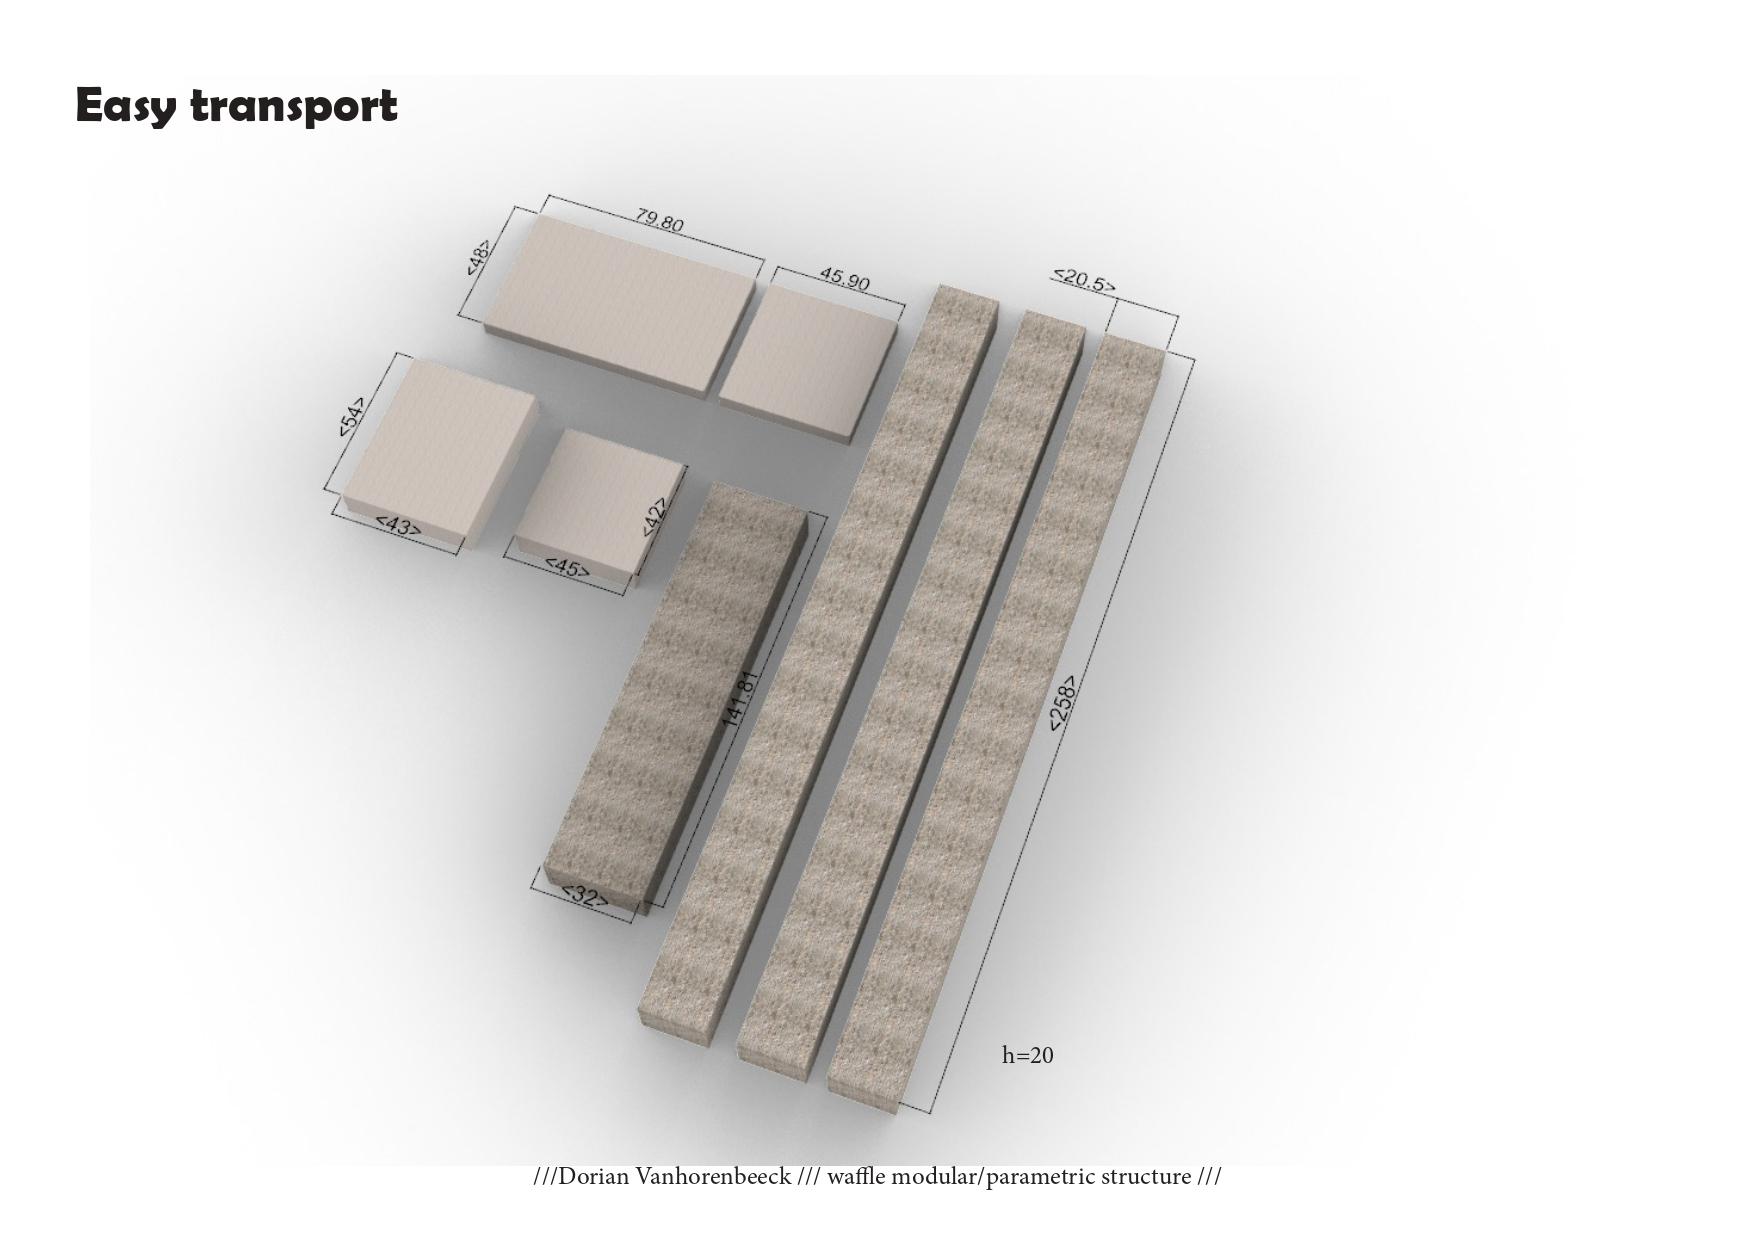 Livret Waffle modular-parametric Structure Dorian Vanhorenbeeck_page-0005